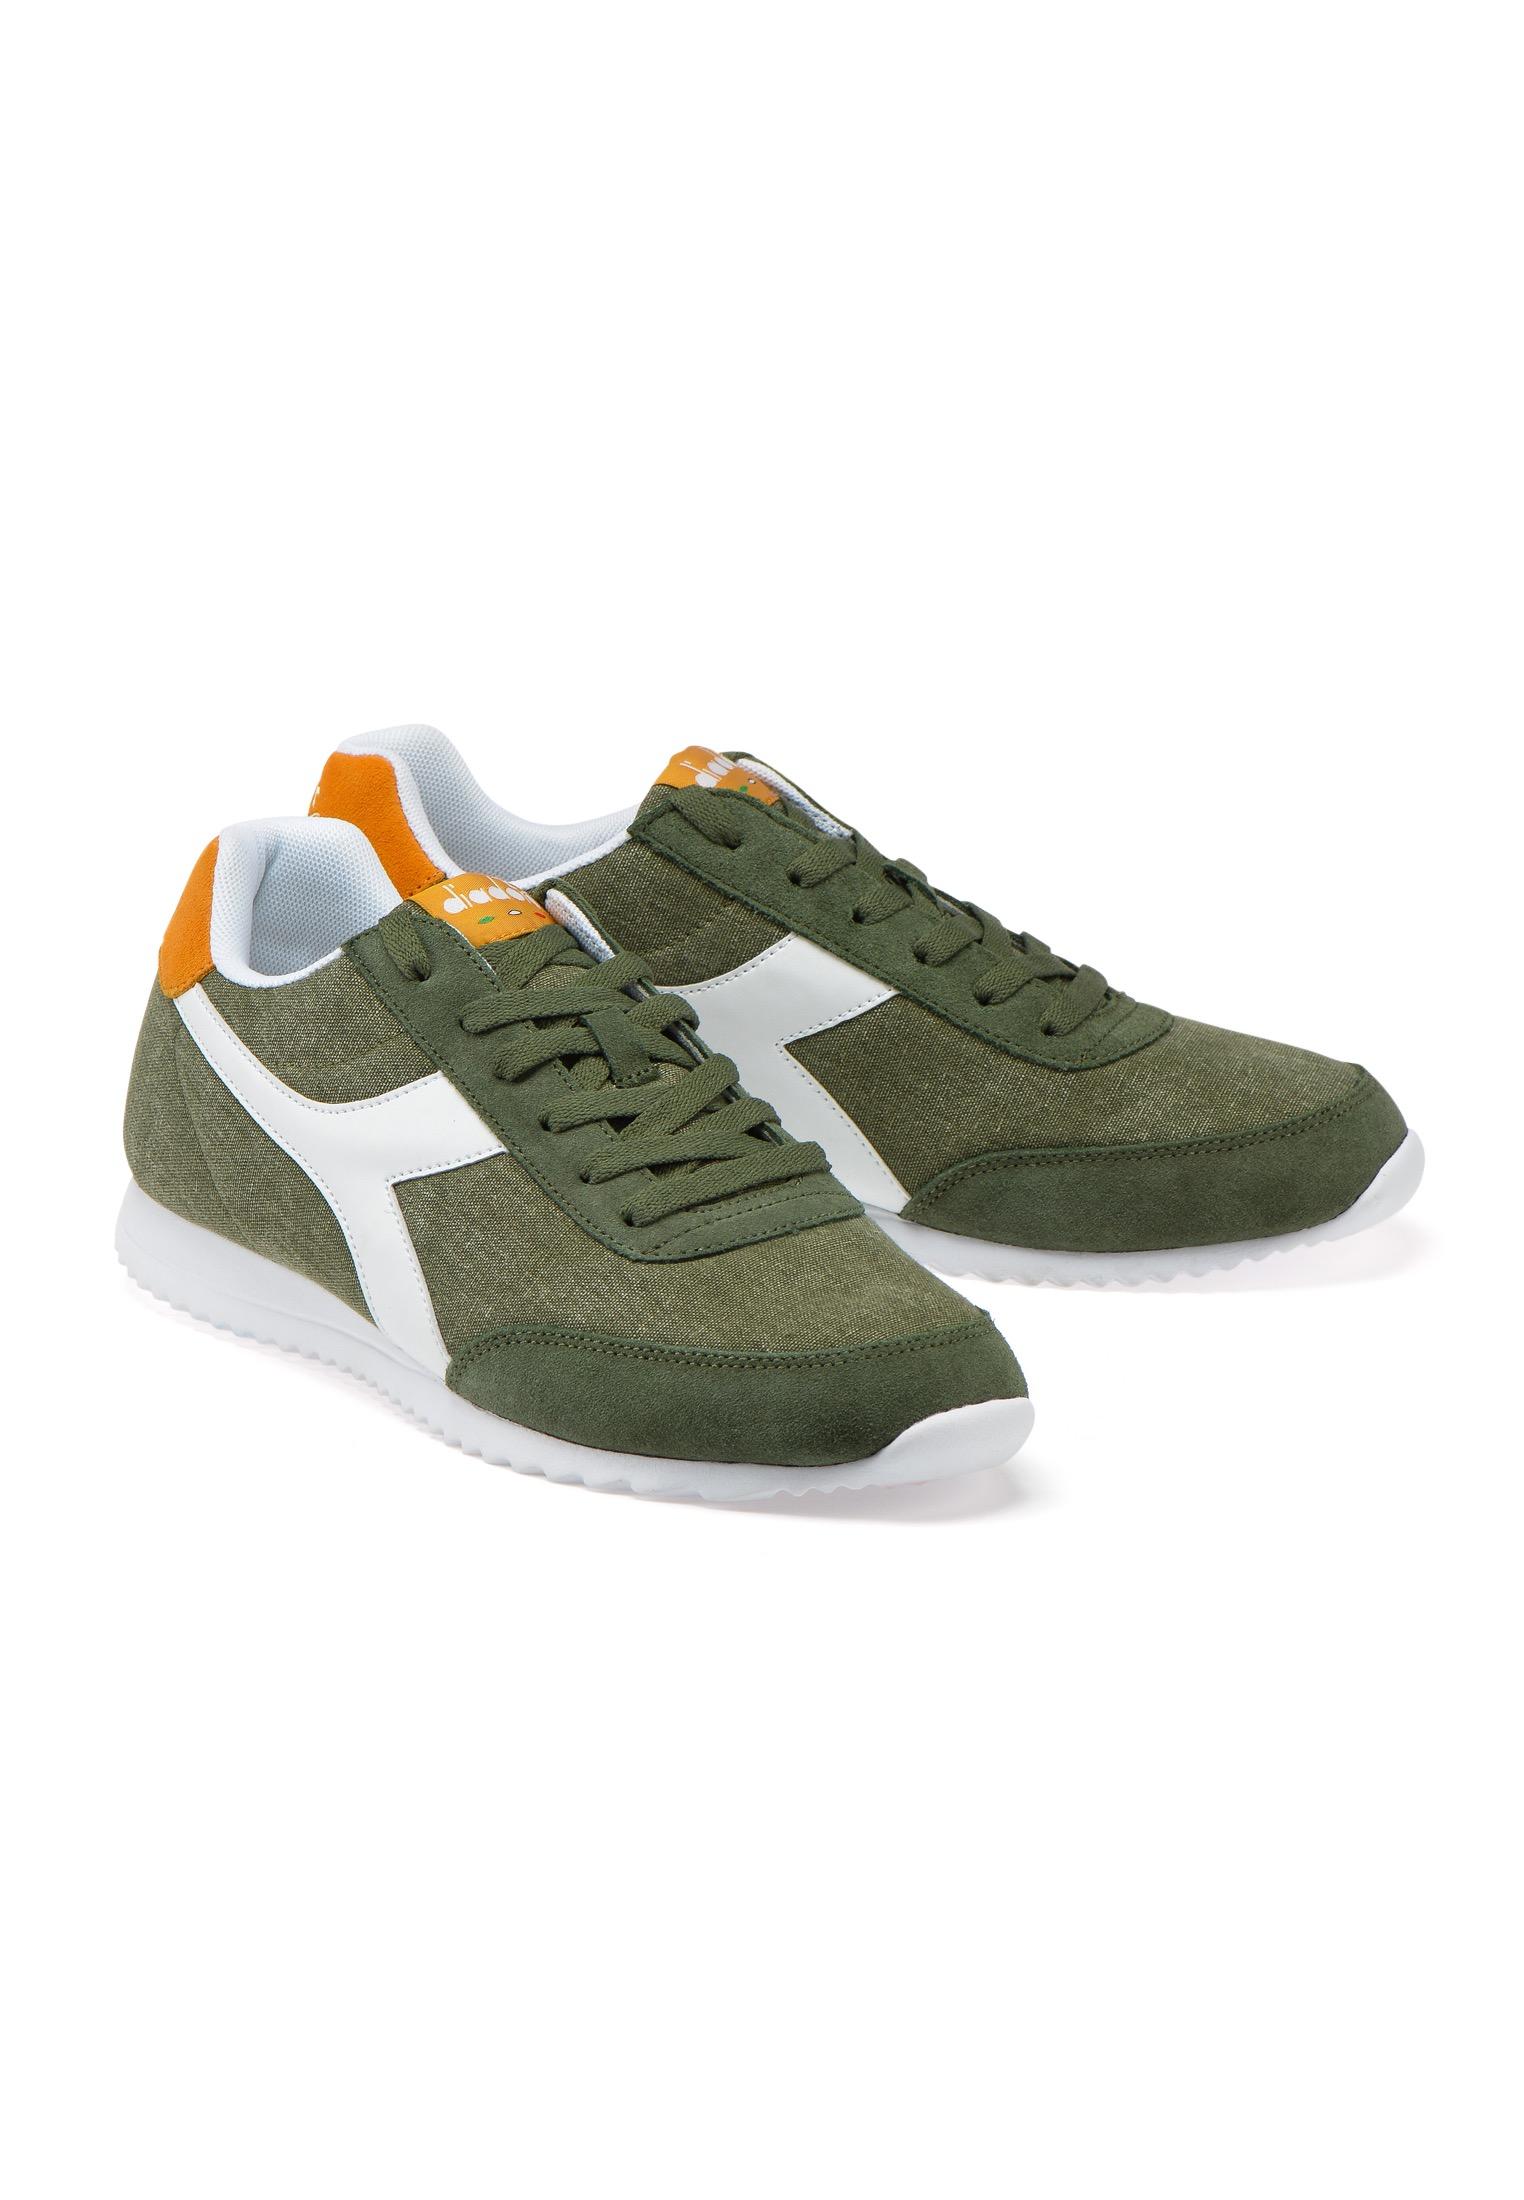 Scarpe-Diadora-Jog-Light-C-Sneakers-sportive-uomo-donna-vari-colori-e-taglie miniatura 42